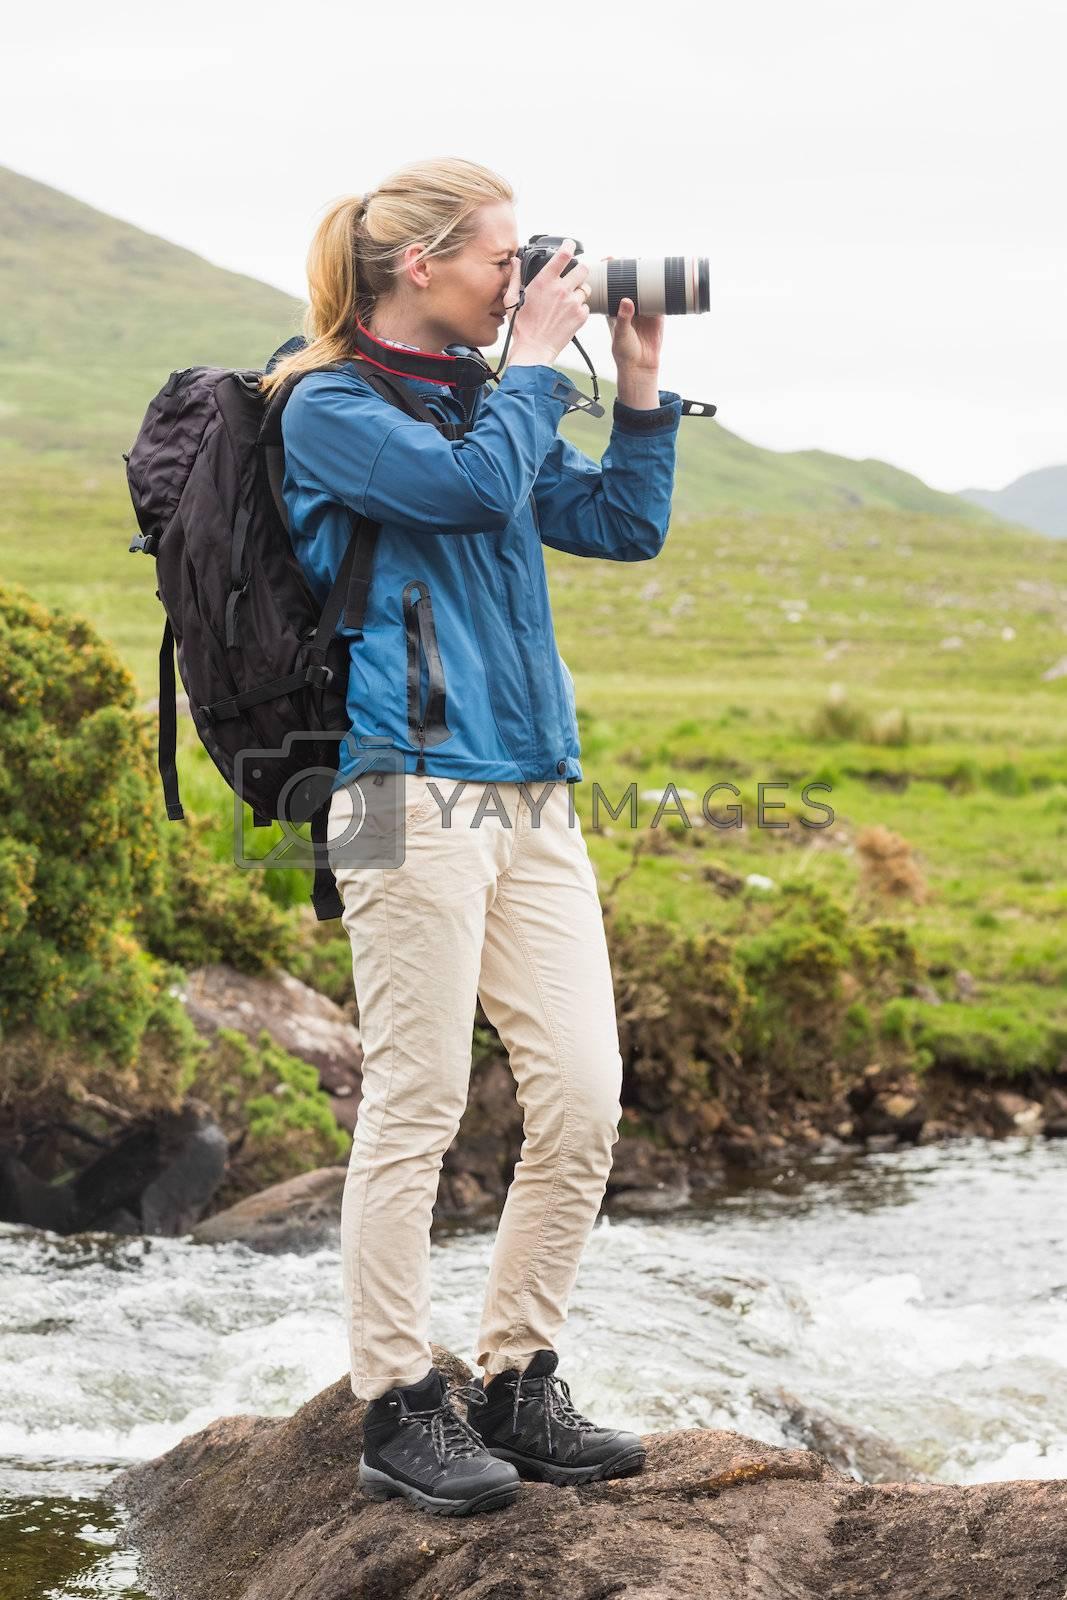 Blonde woman on a hike taking a photo by Wavebreakmedia